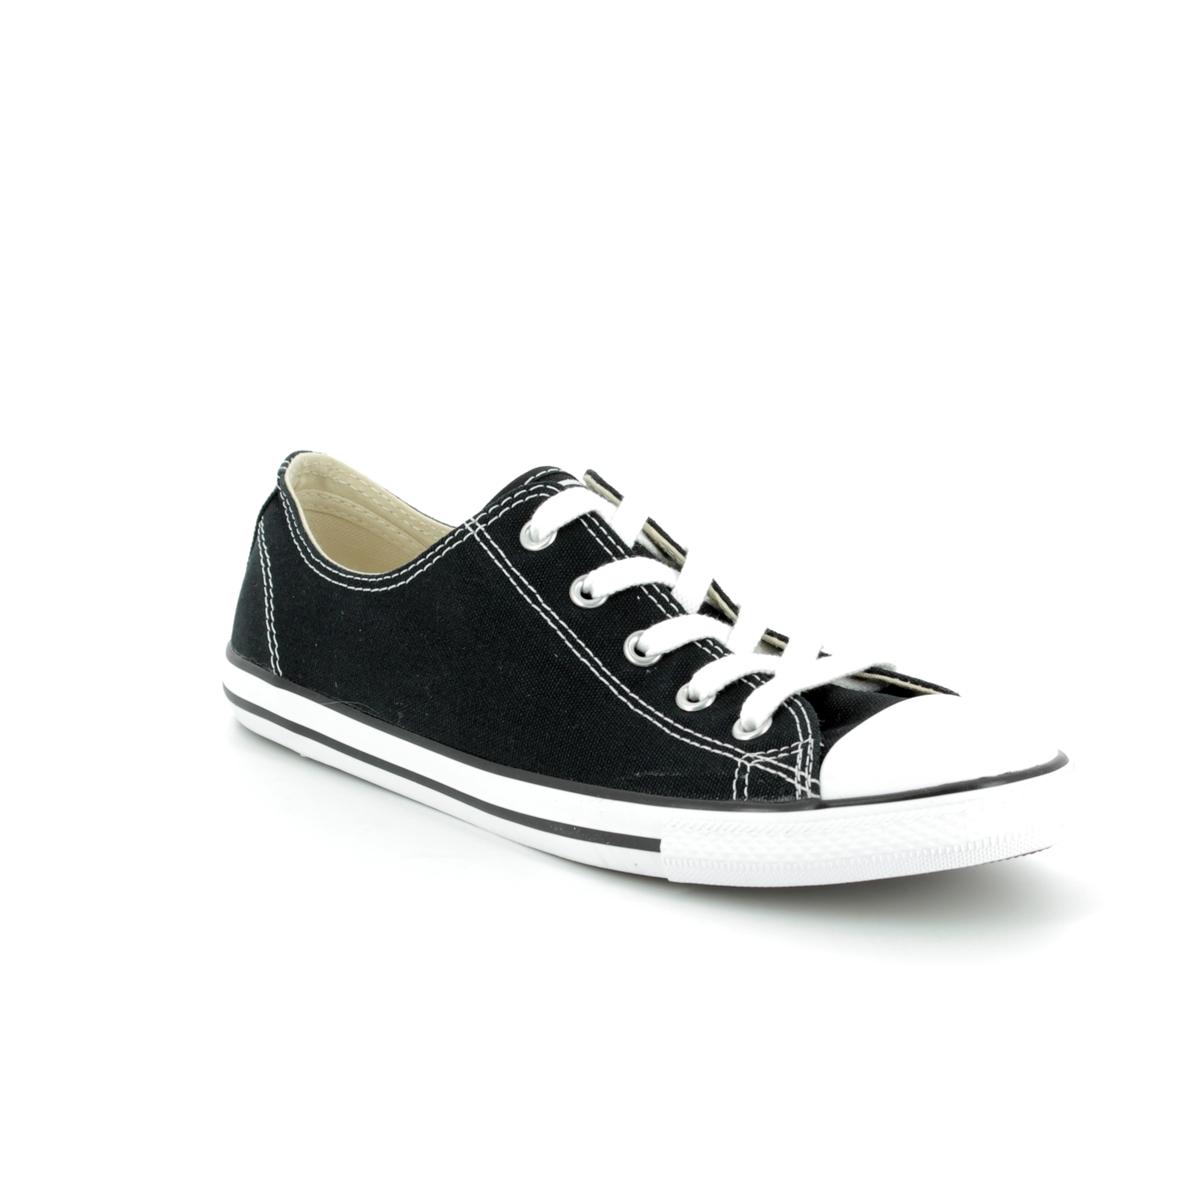 93001ba38f2e Converse Trainers - Black - 530054C ALL STAR DAINTY OX